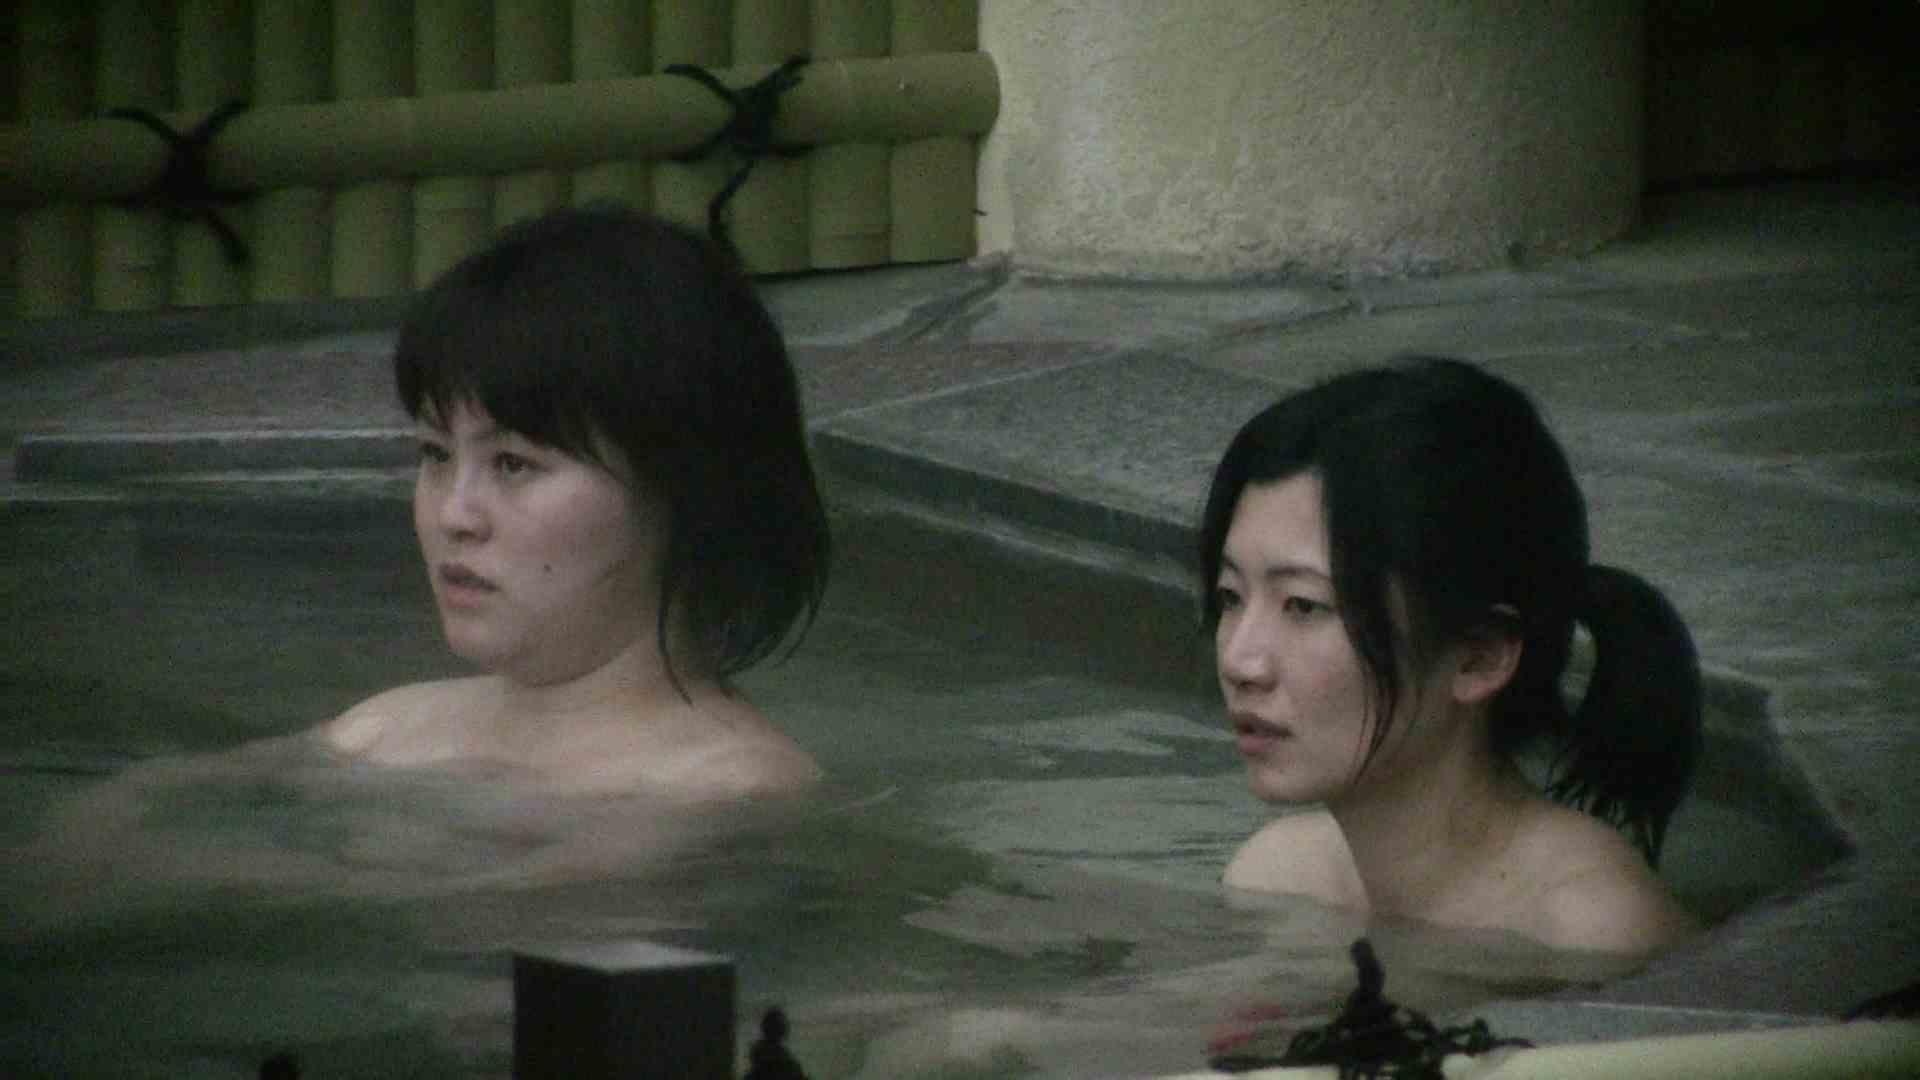 Aquaな露天風呂Vol.539 盗撮  62pic 7